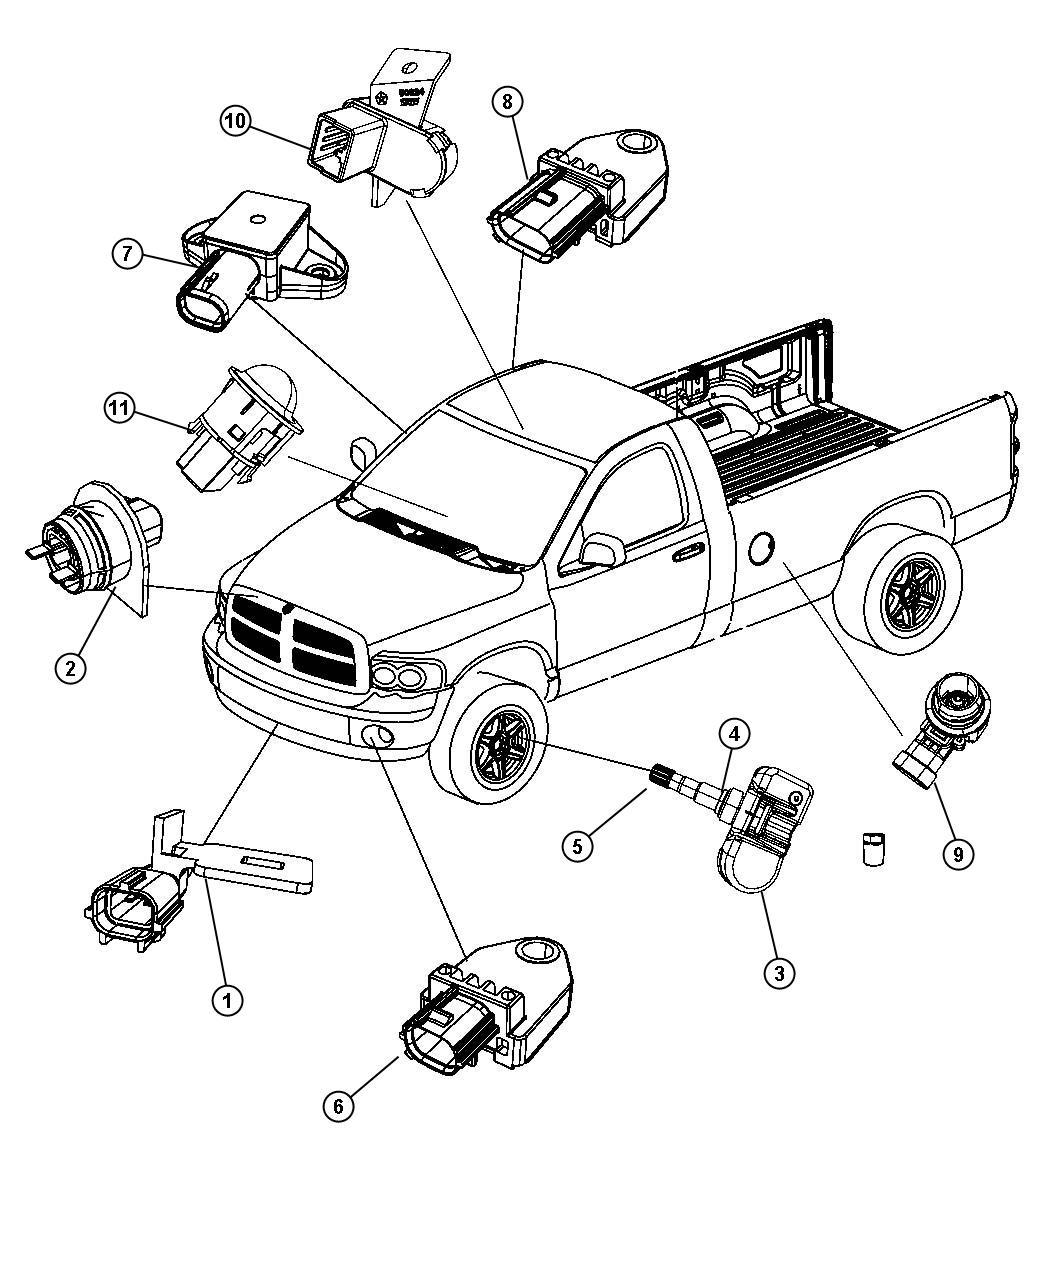 2011 jeep liberty sensor  infrared  trim    o0    rear